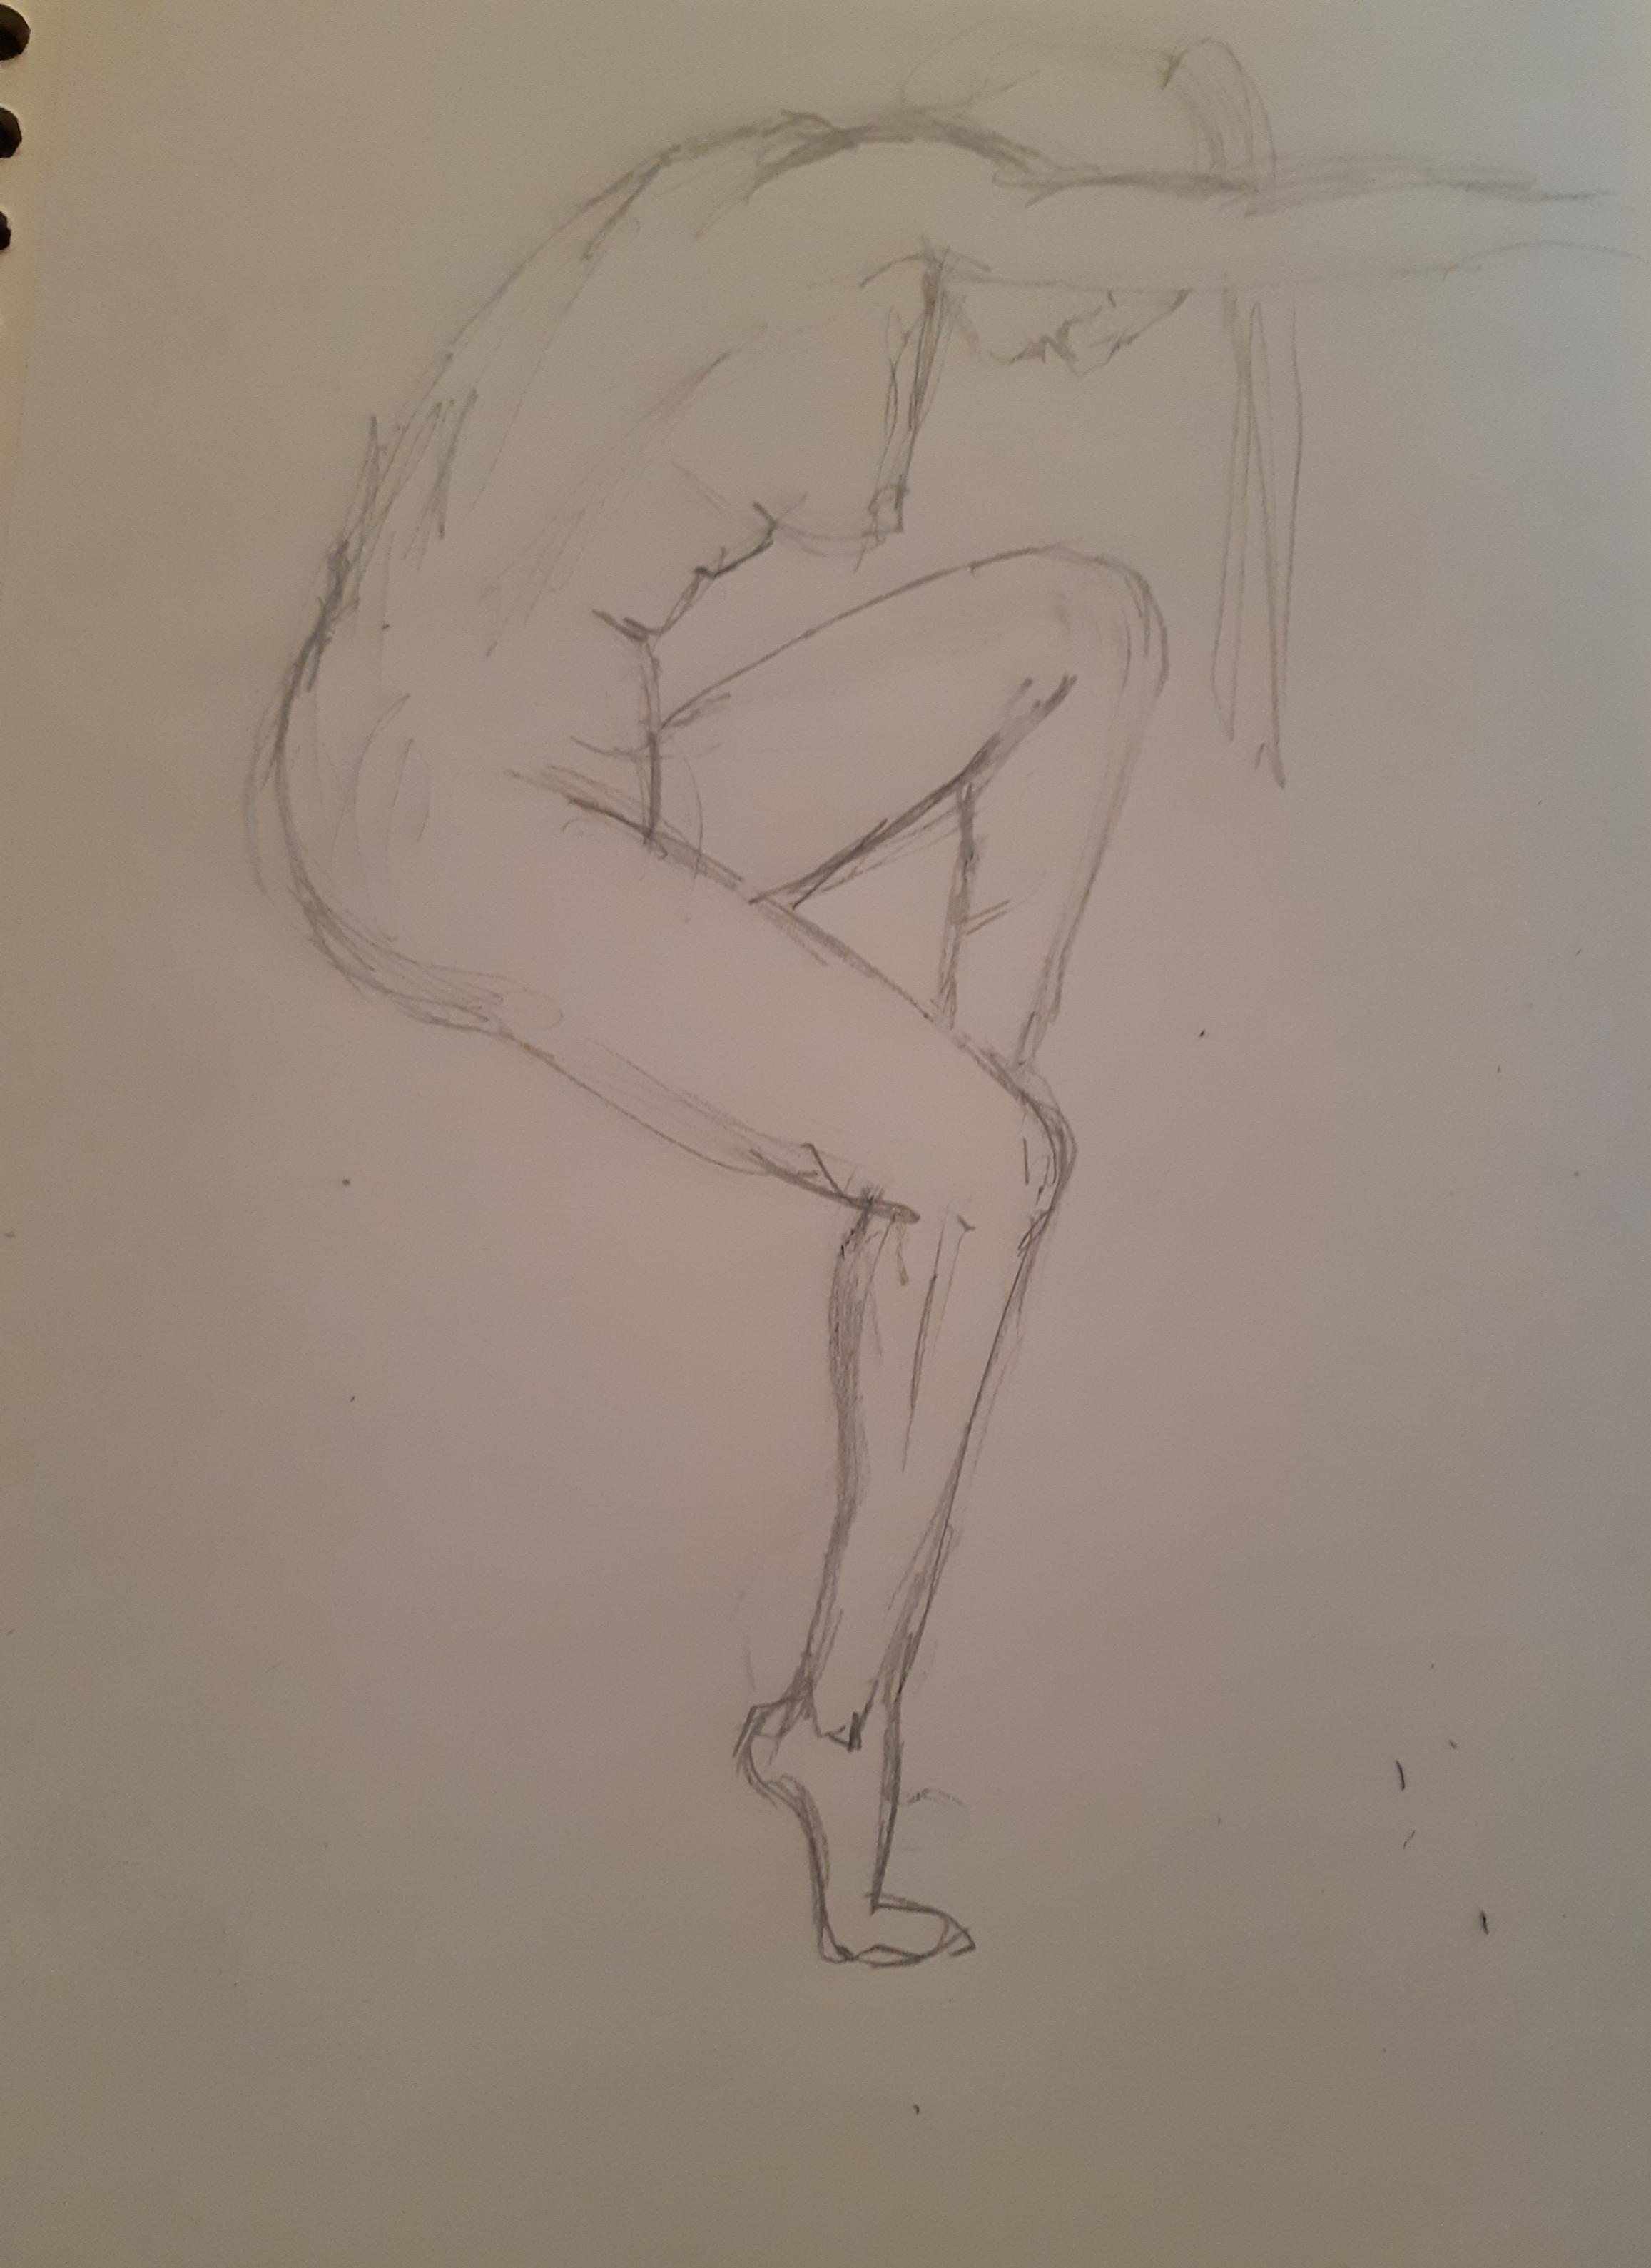 Dessin profil �tude crayon de papier  cours de dessin